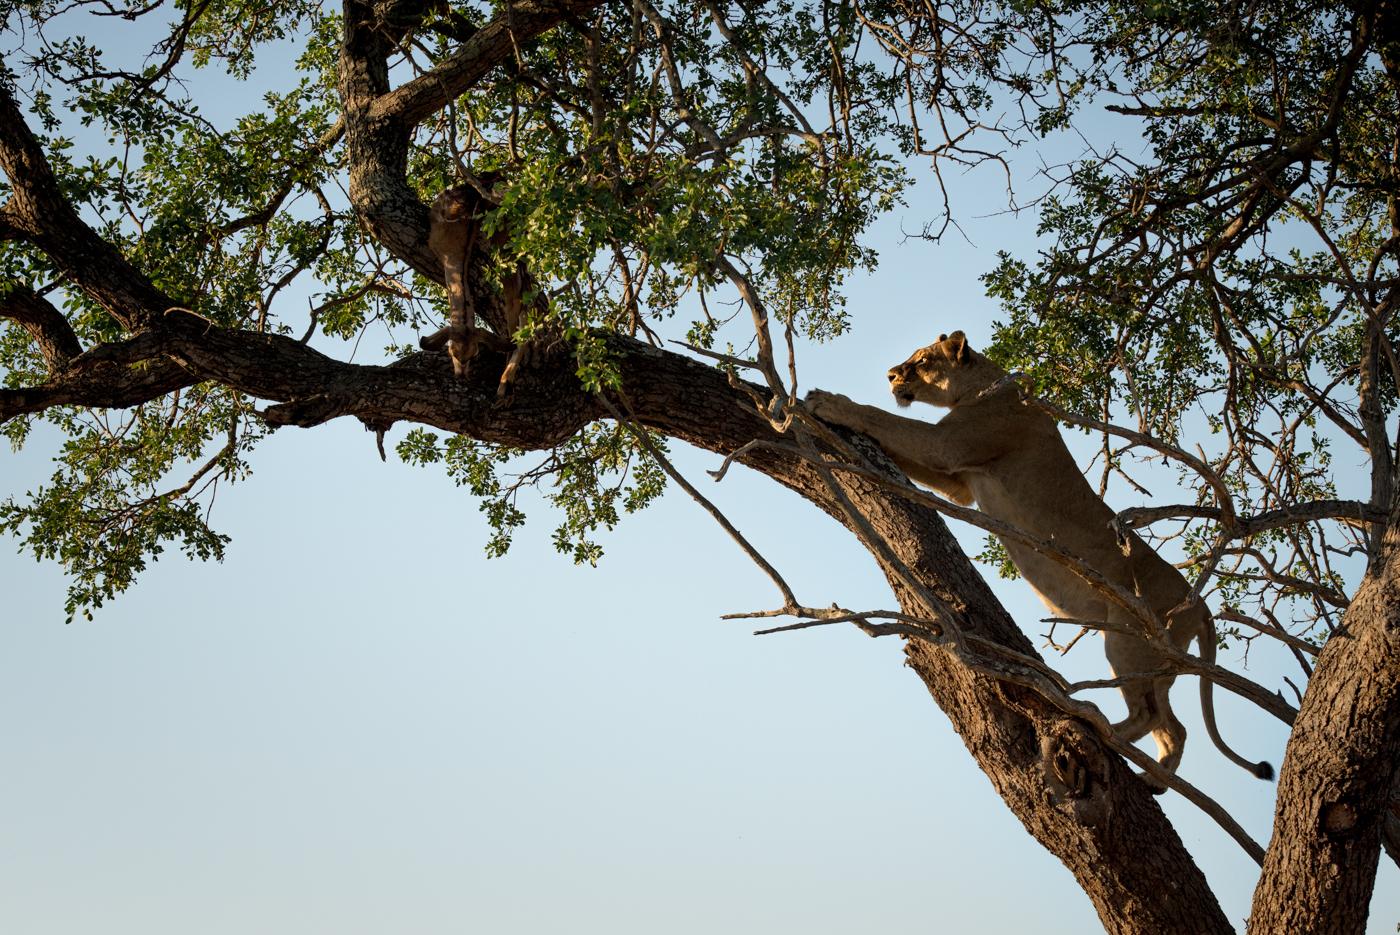 mhangeni lioness in tree, feb 2016, SC